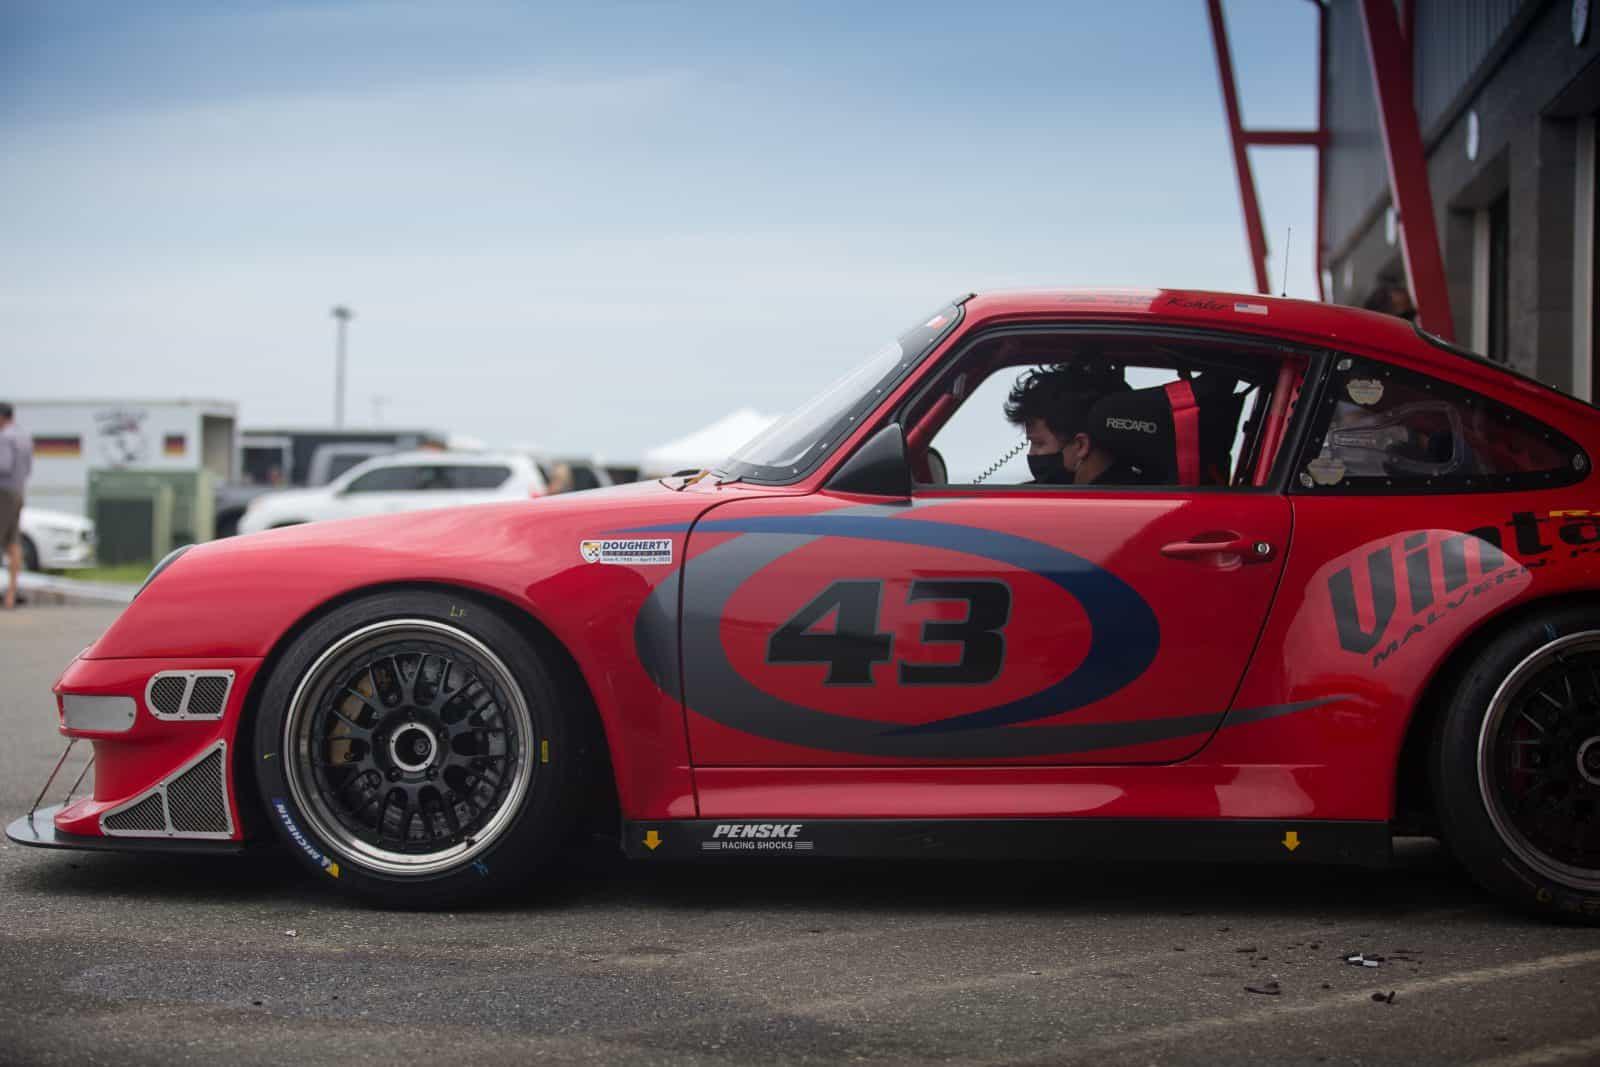 Porsche leaving the paddock